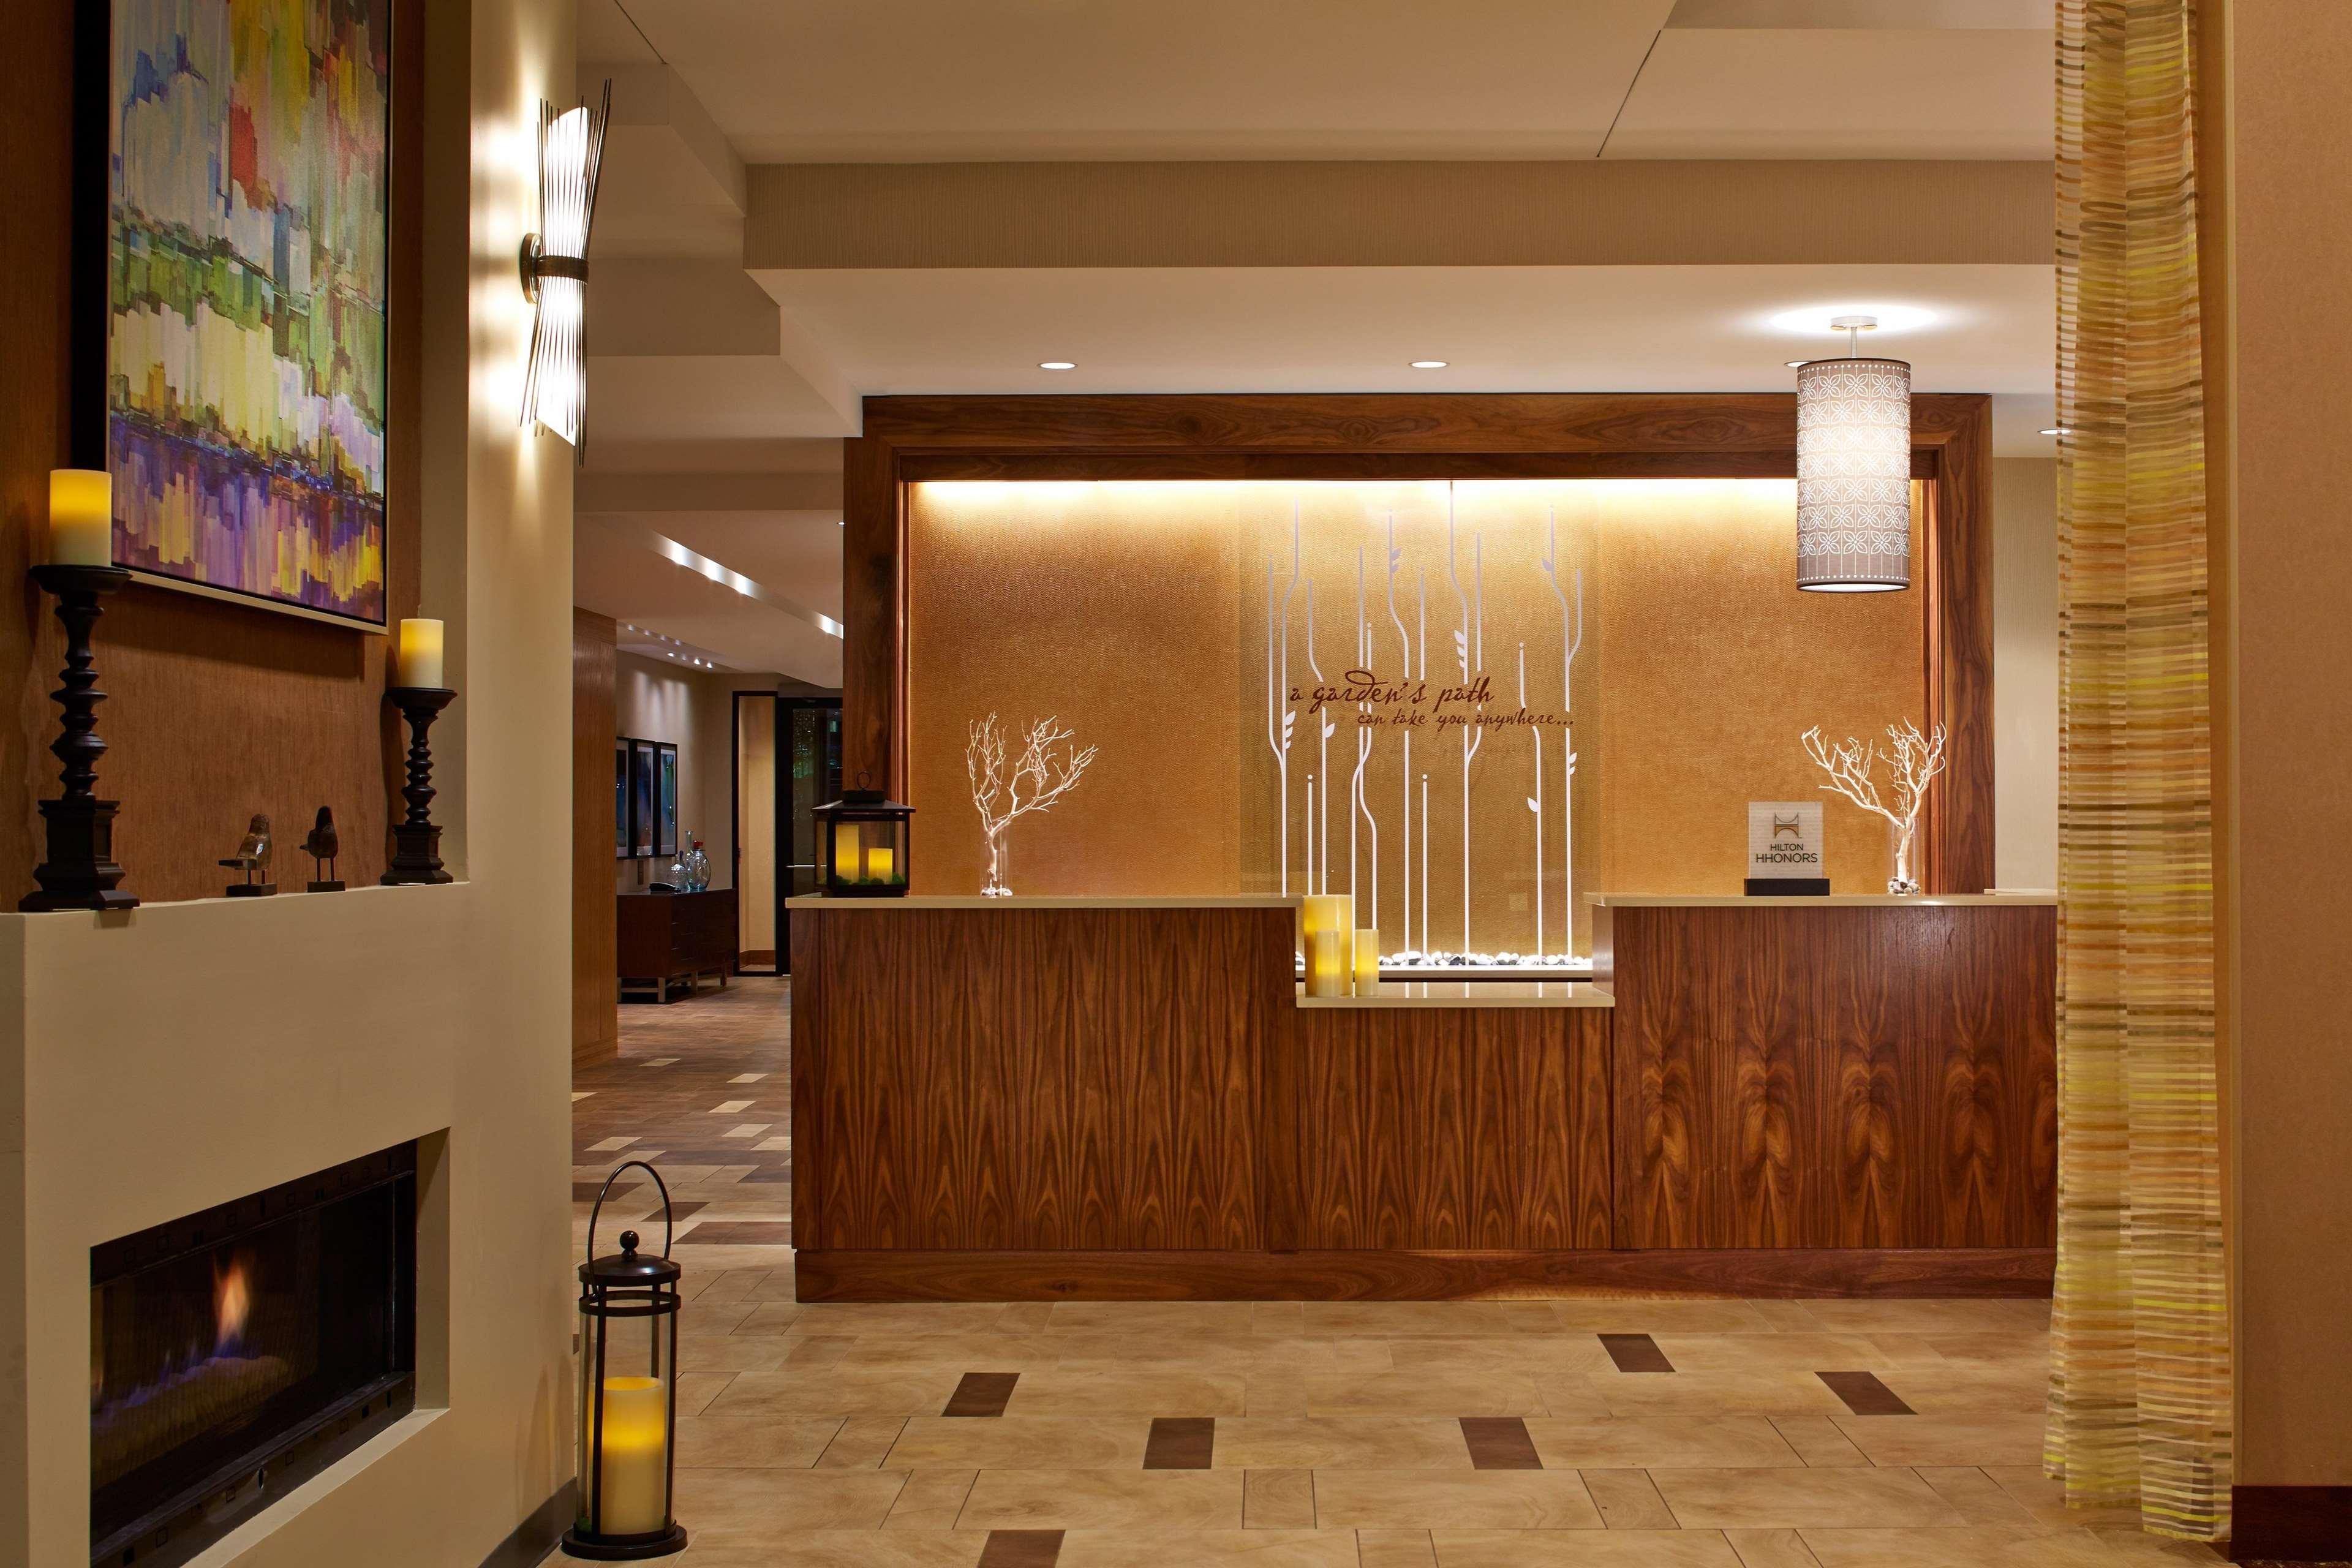 Hilton Garden Inn Boston/Marlborough image 38